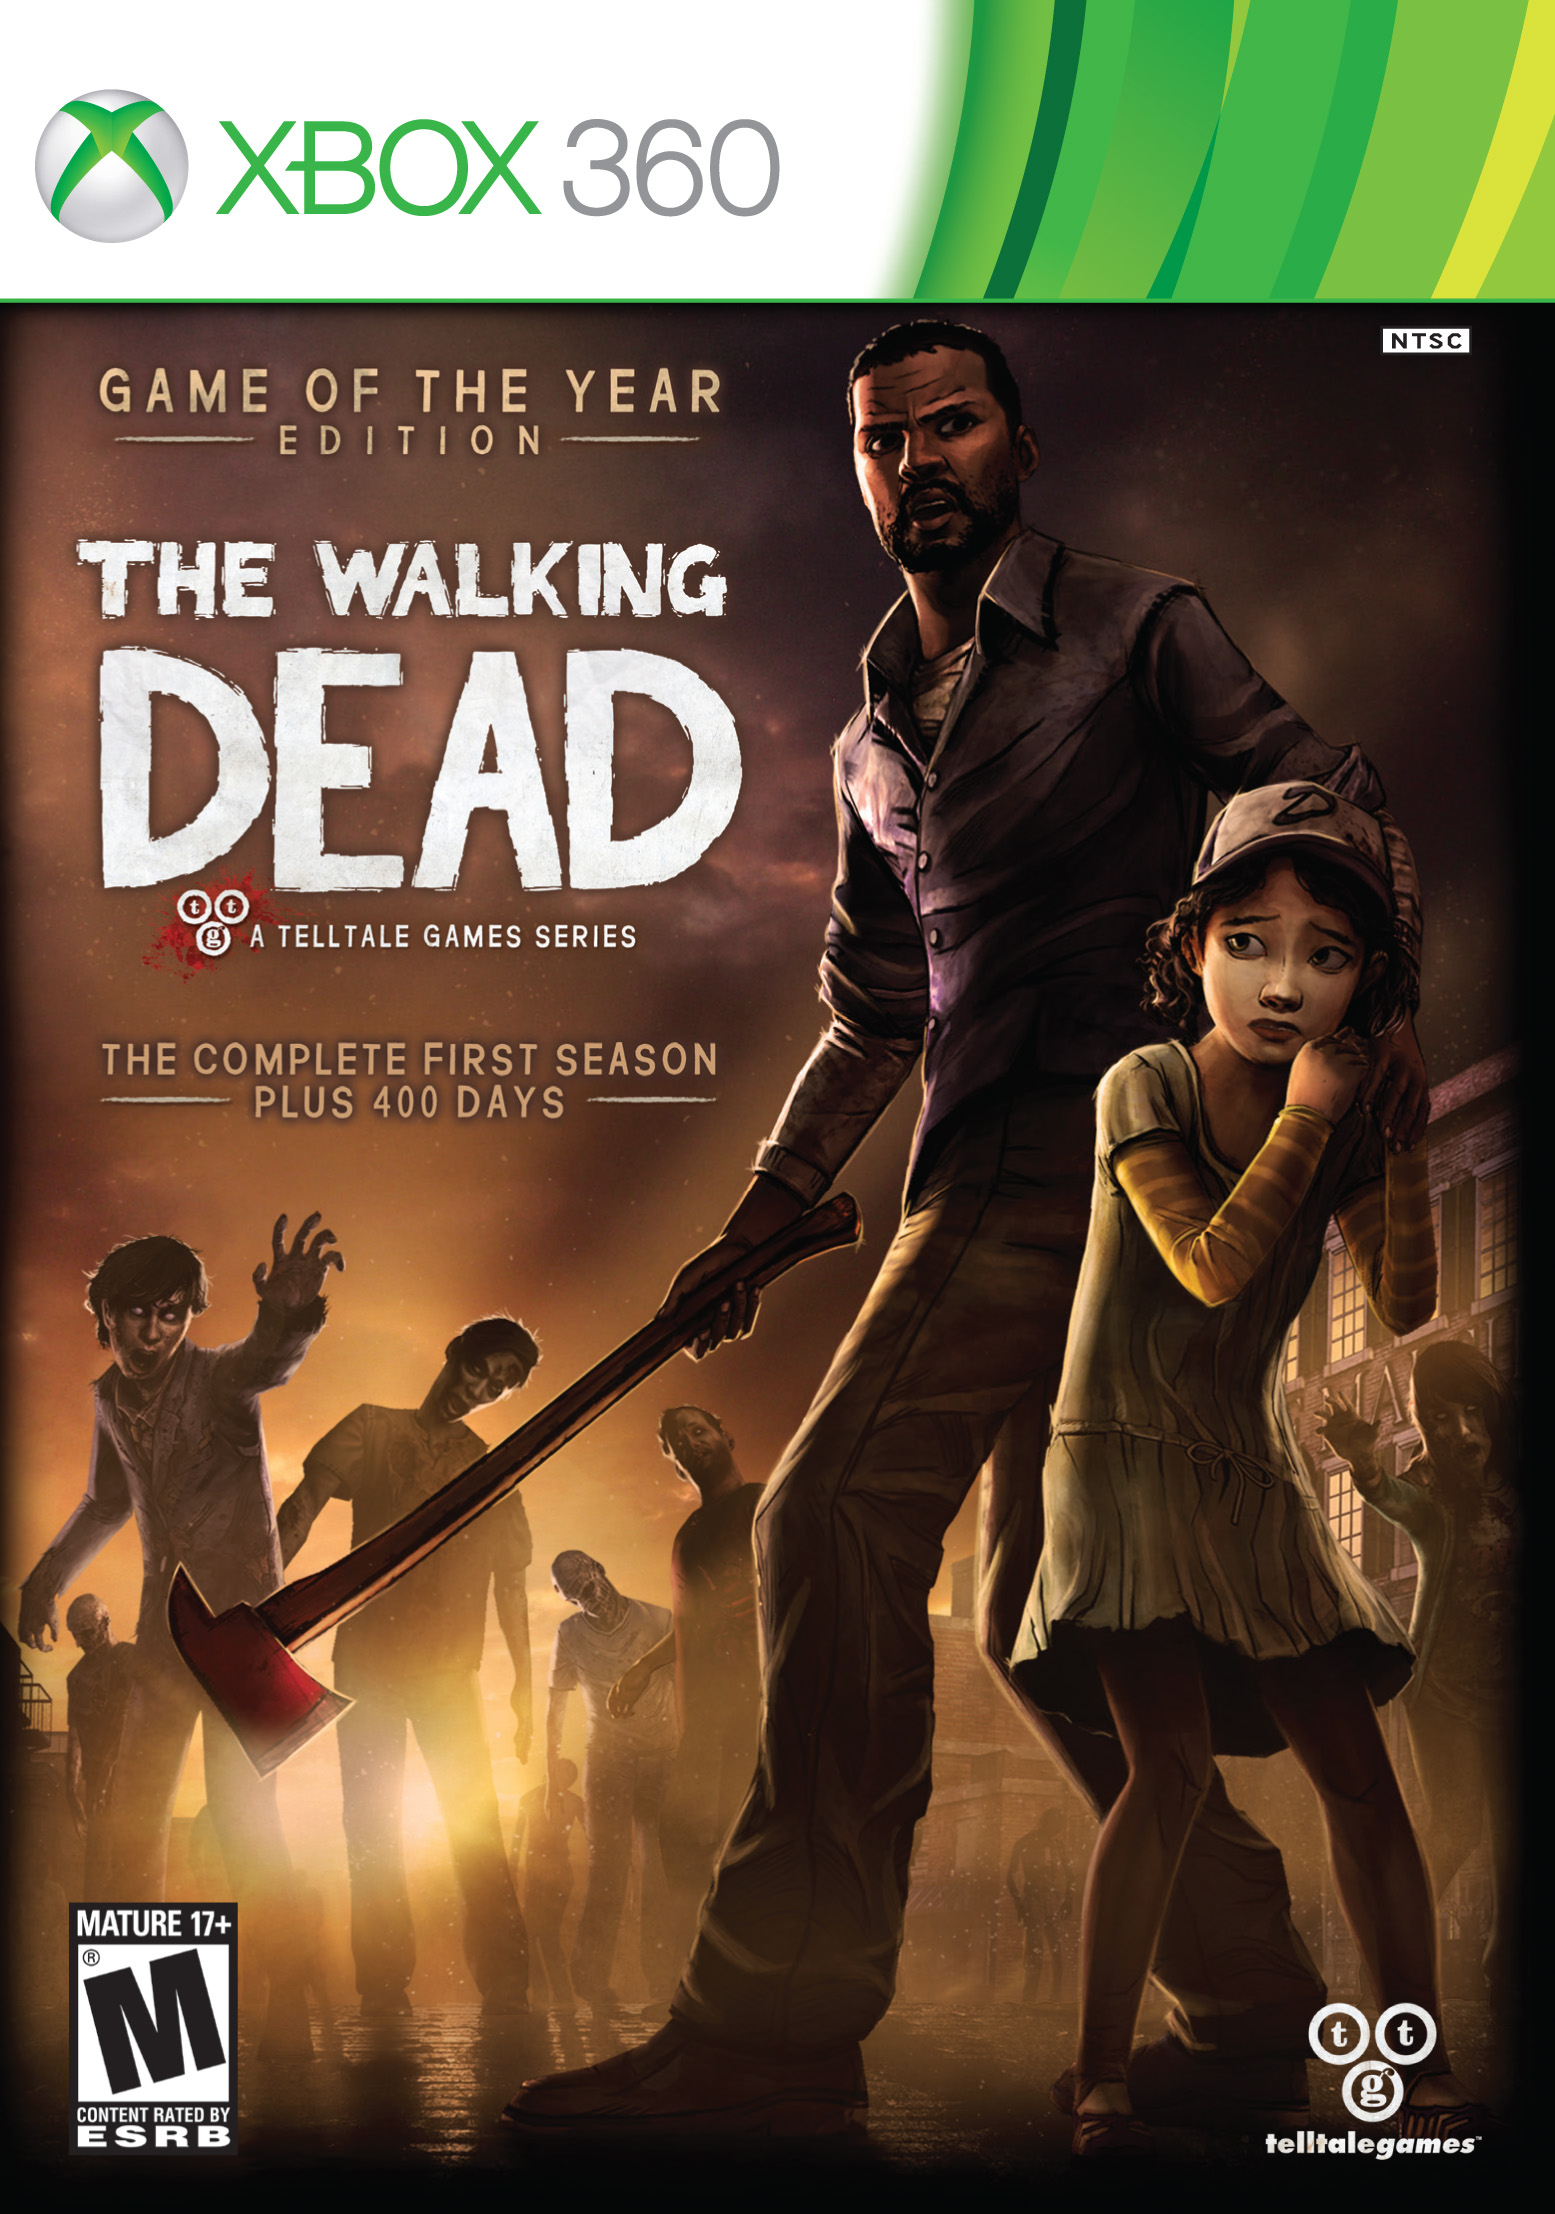 The Walking Dead Saison 1 Ep 1 : walking, saison, Walking, Archives, MonsterVine